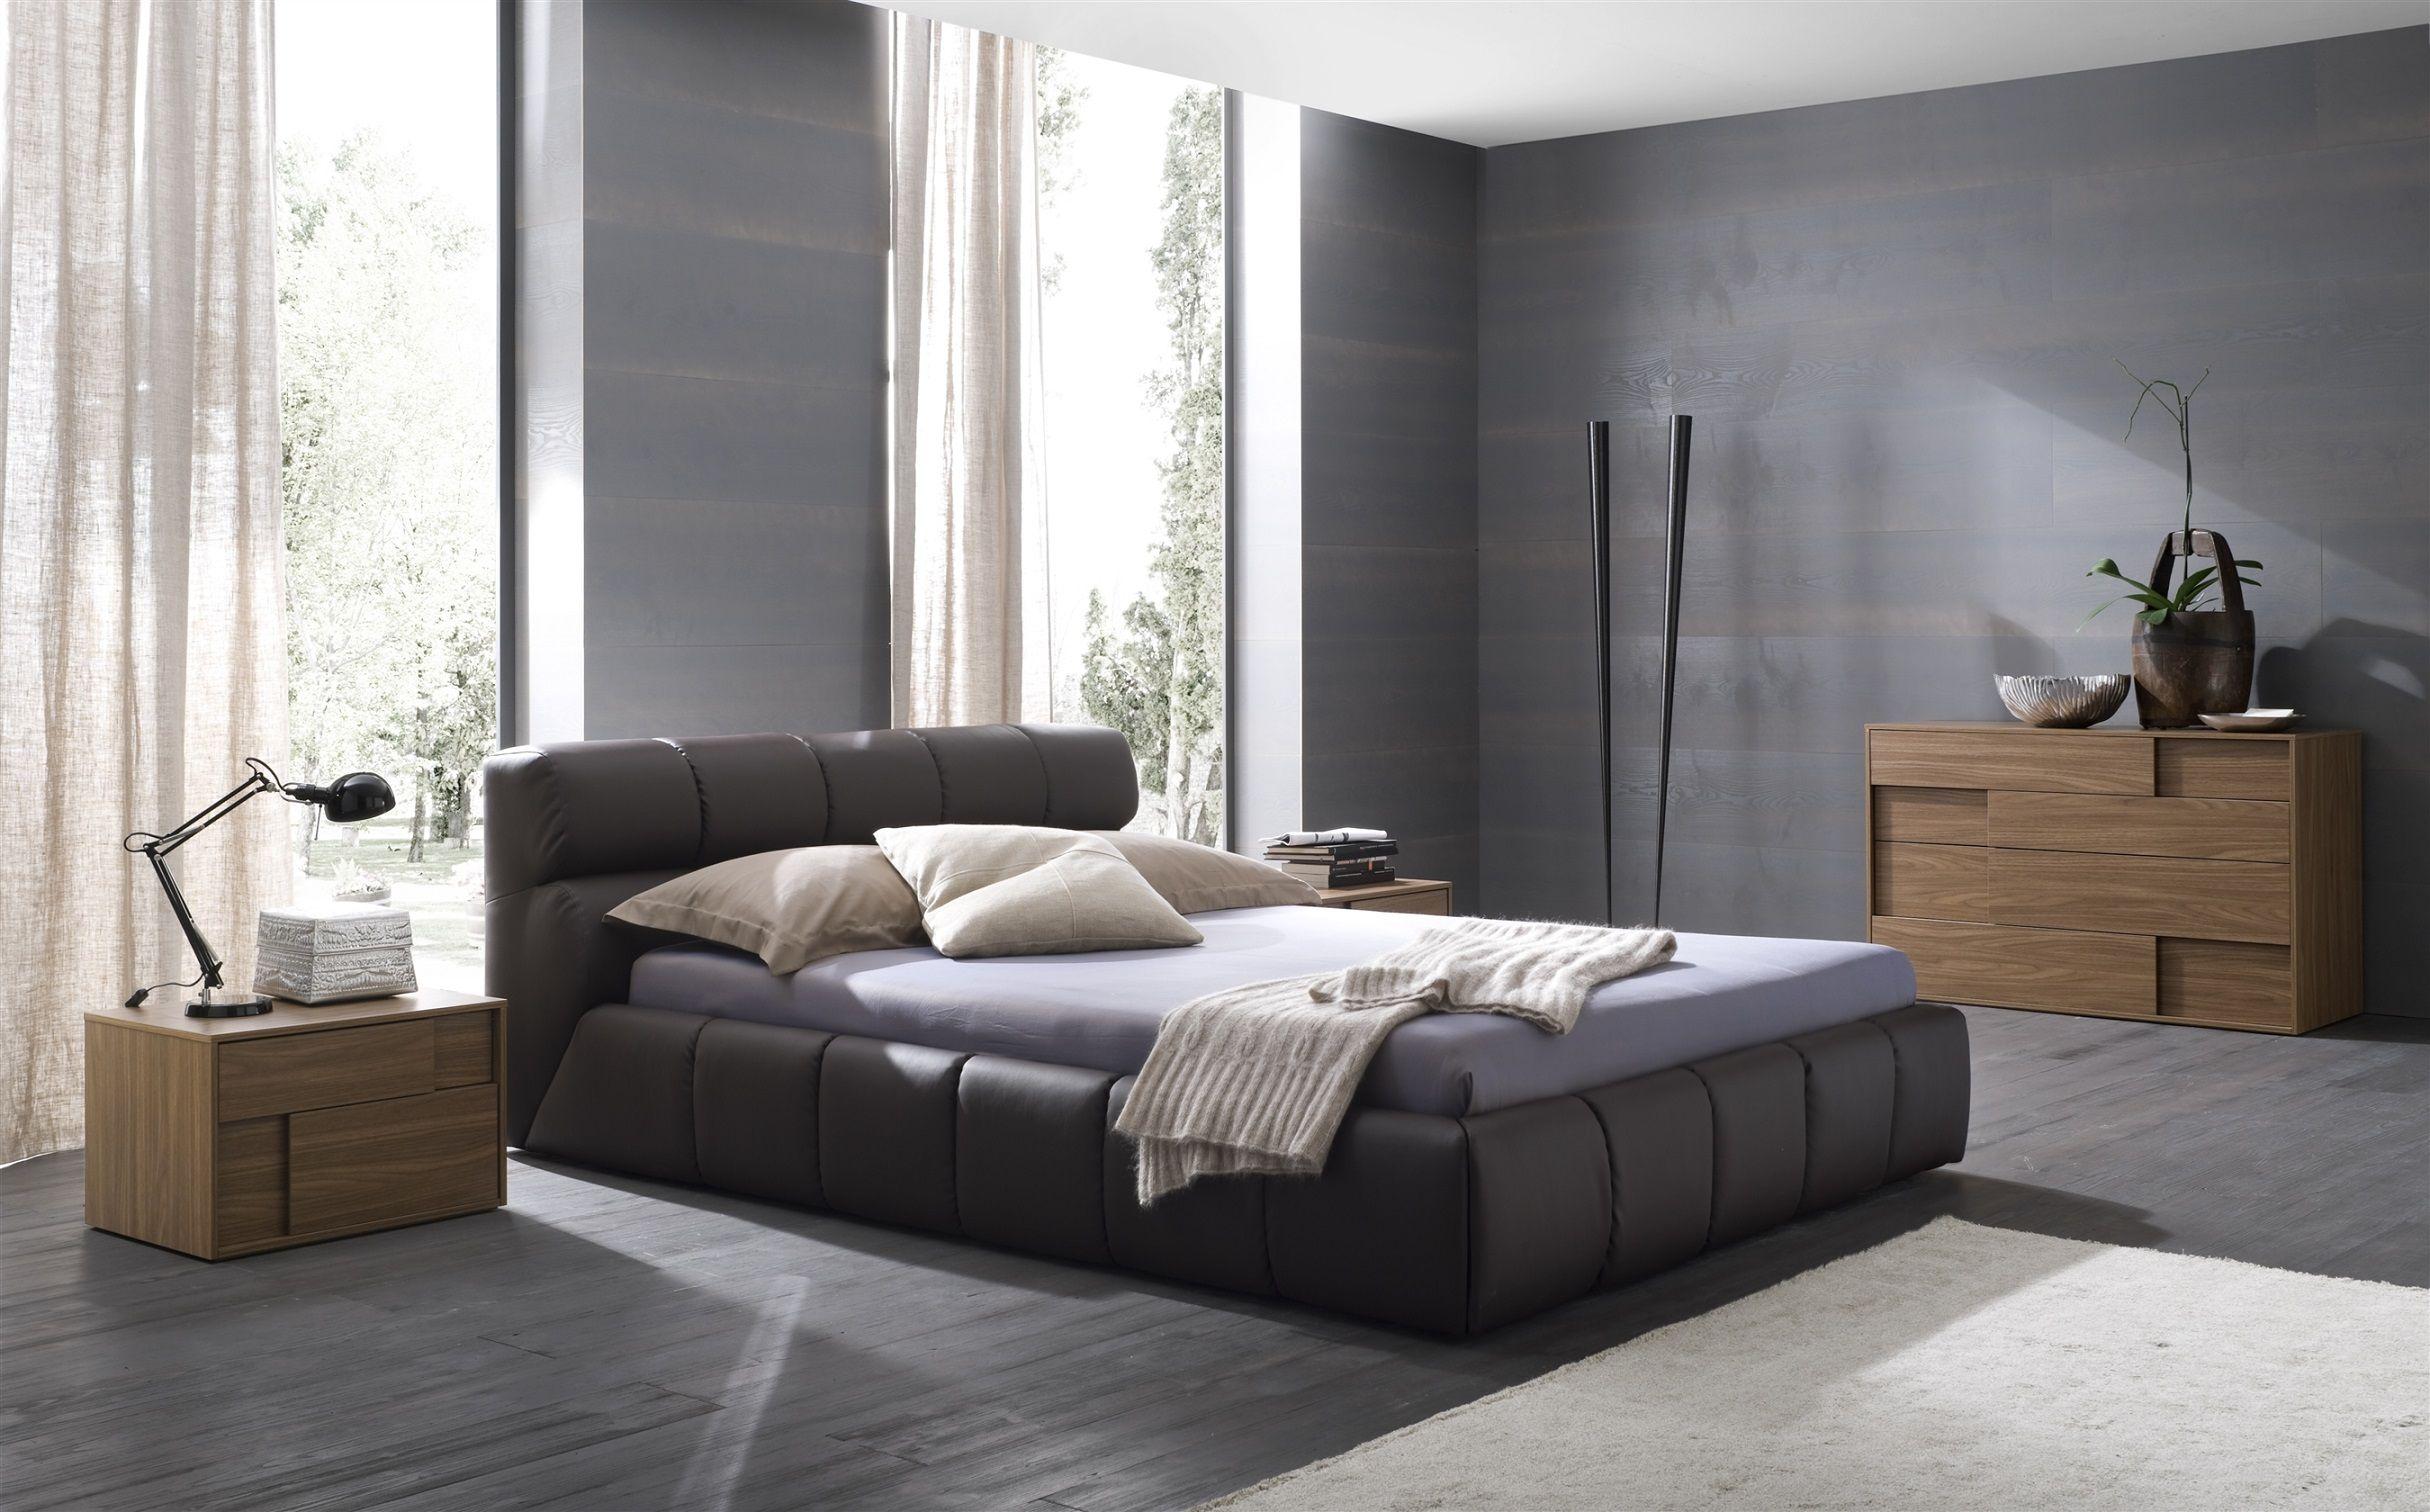 Explore Bedroom Ideas Grey, Men Bedroom, And More!